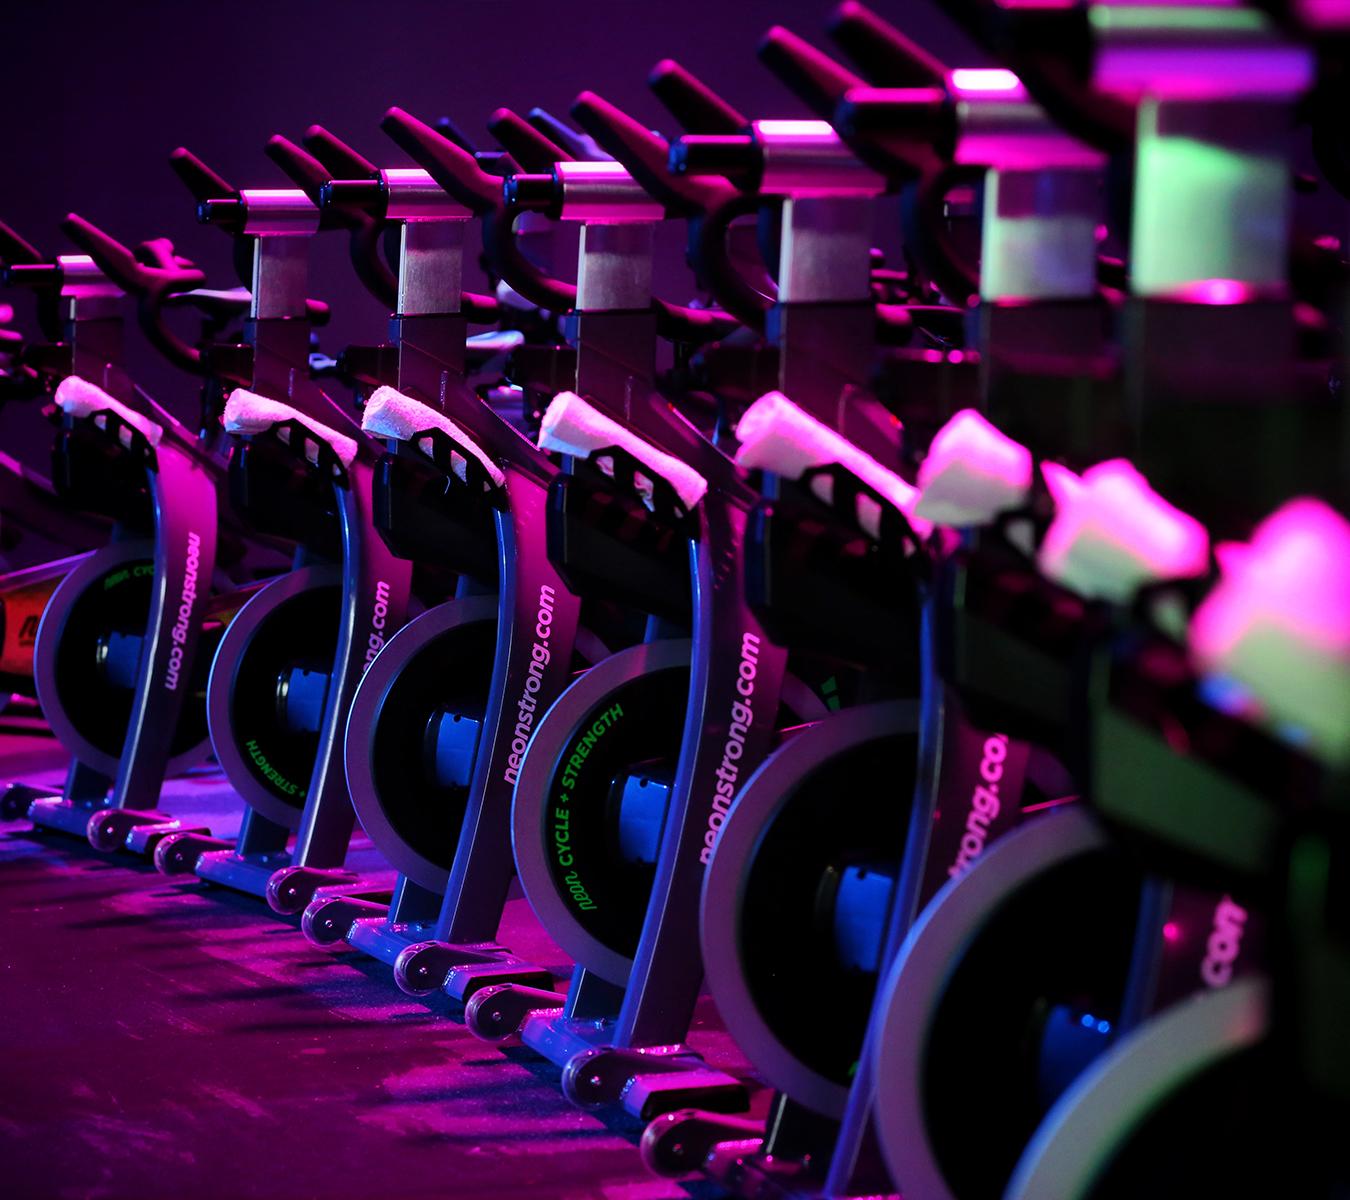 012119.spinbikes.jpg